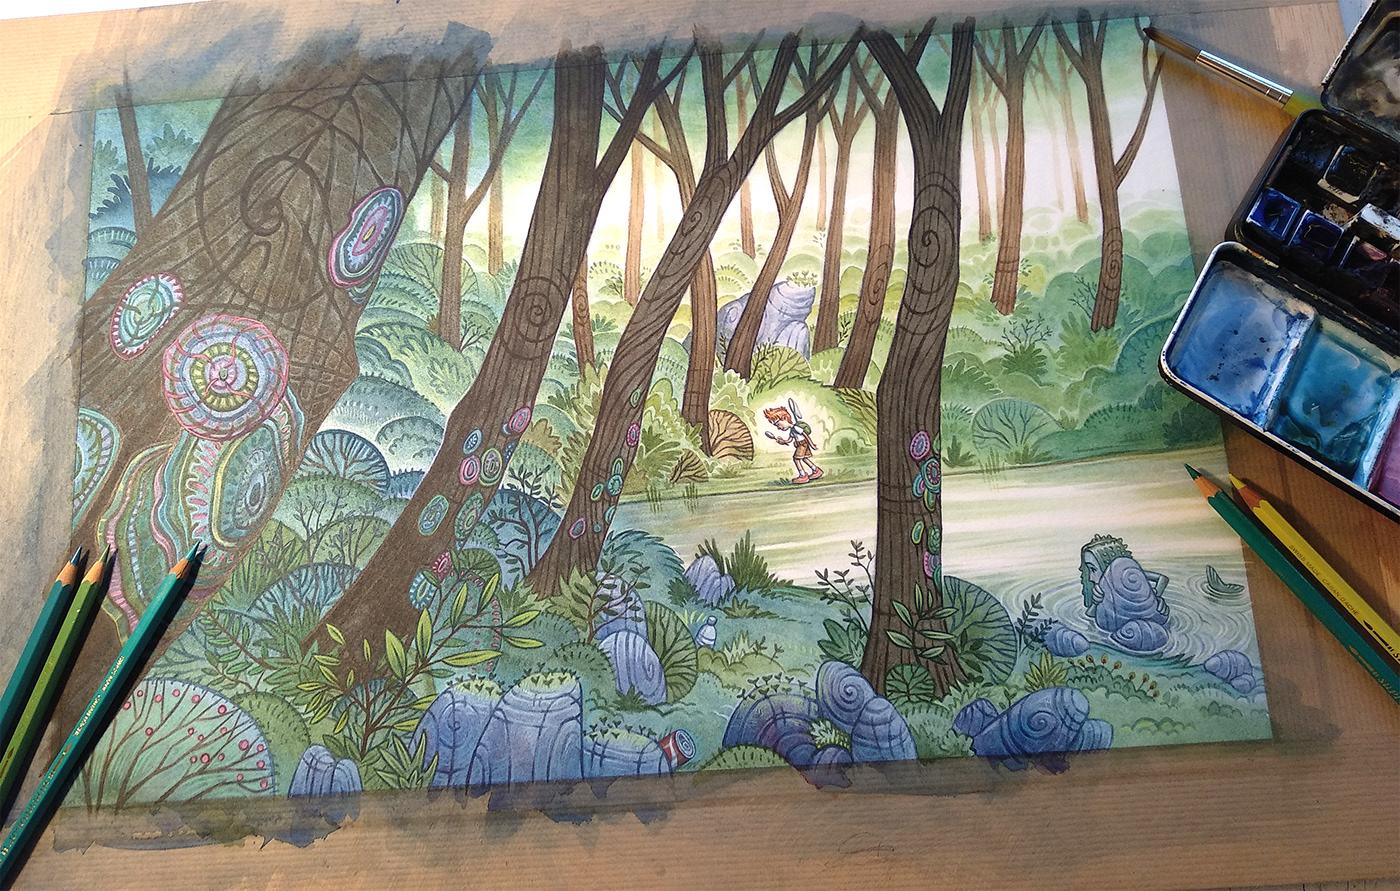 Image may contain: painting, drawing and cartoon